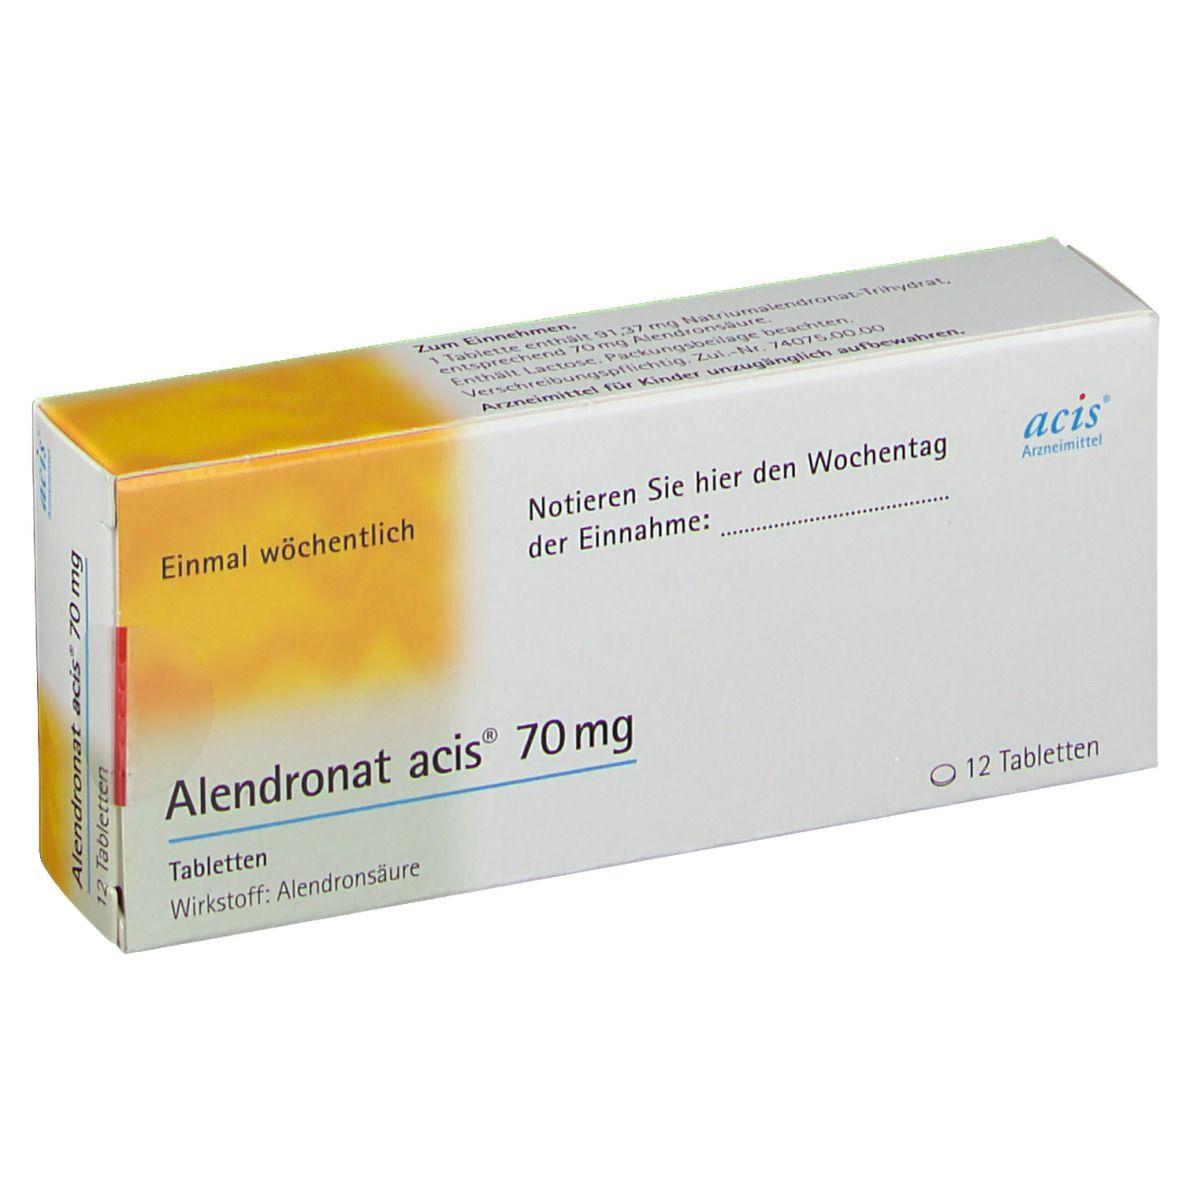 ALENDRONAT acis 70 mg Tabletten